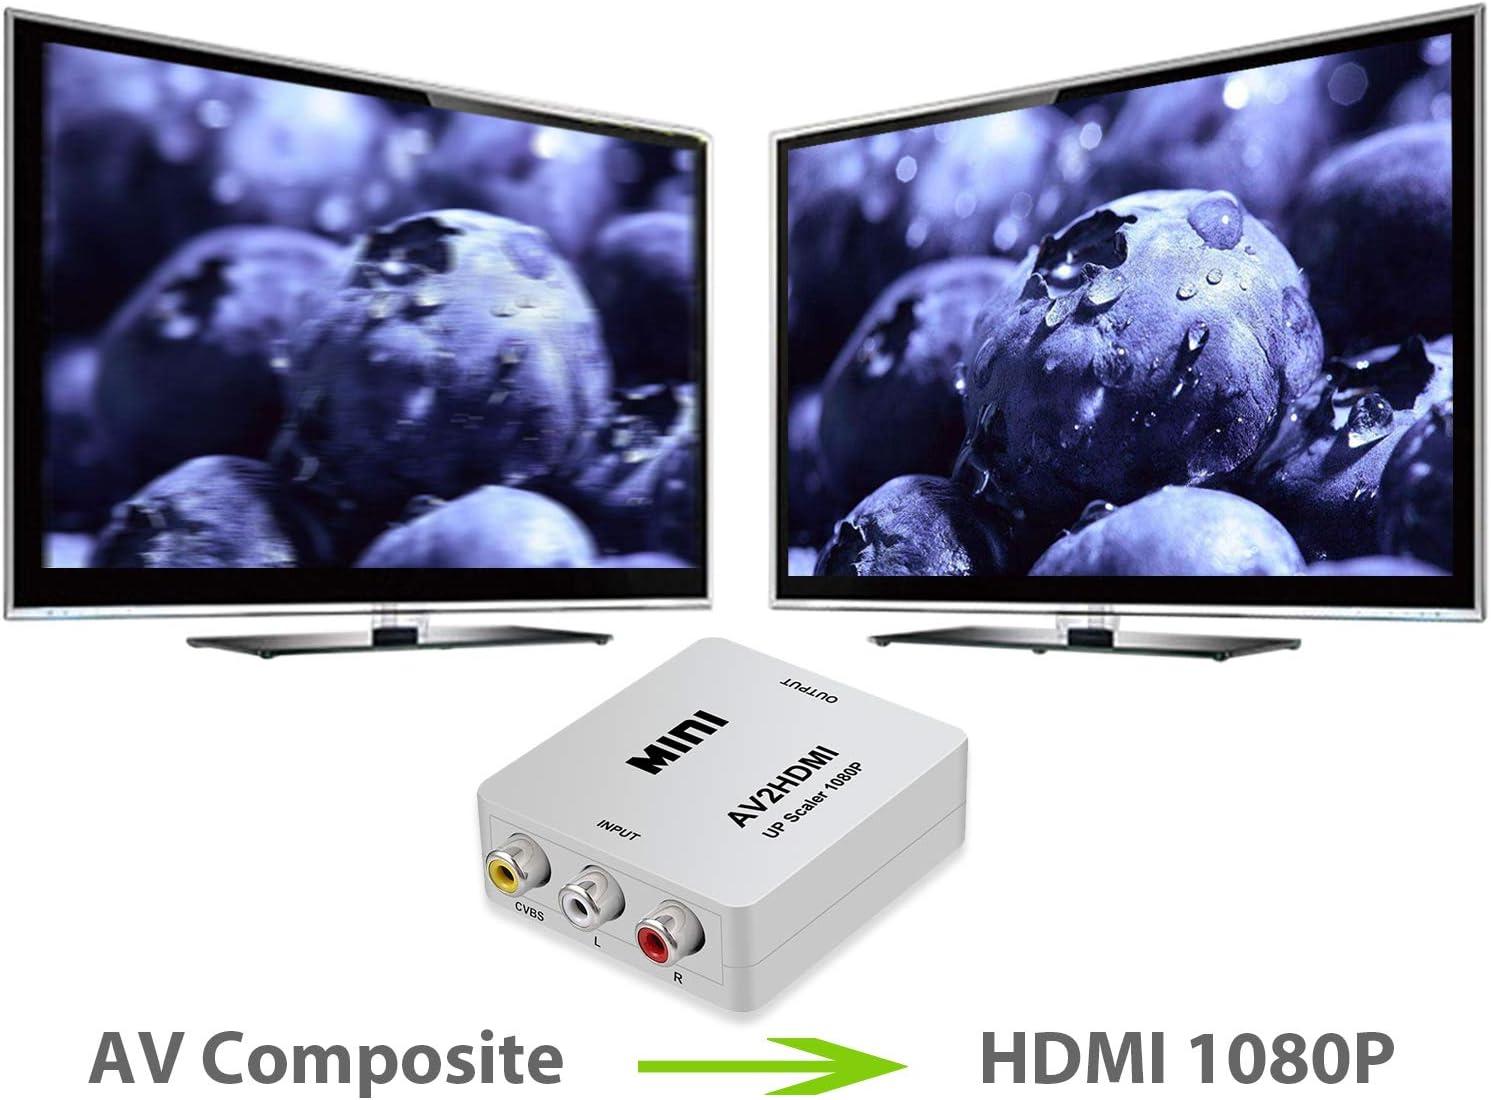 AV RCA a HDMI Adaptador 1080p AV 3RCA CVBS Compuesto a HDMI Conversor de Audio y Video Compatible con PAL/NTSC con Cable de RCA para PC Laptop Xbox PS4 PS3 TV STB